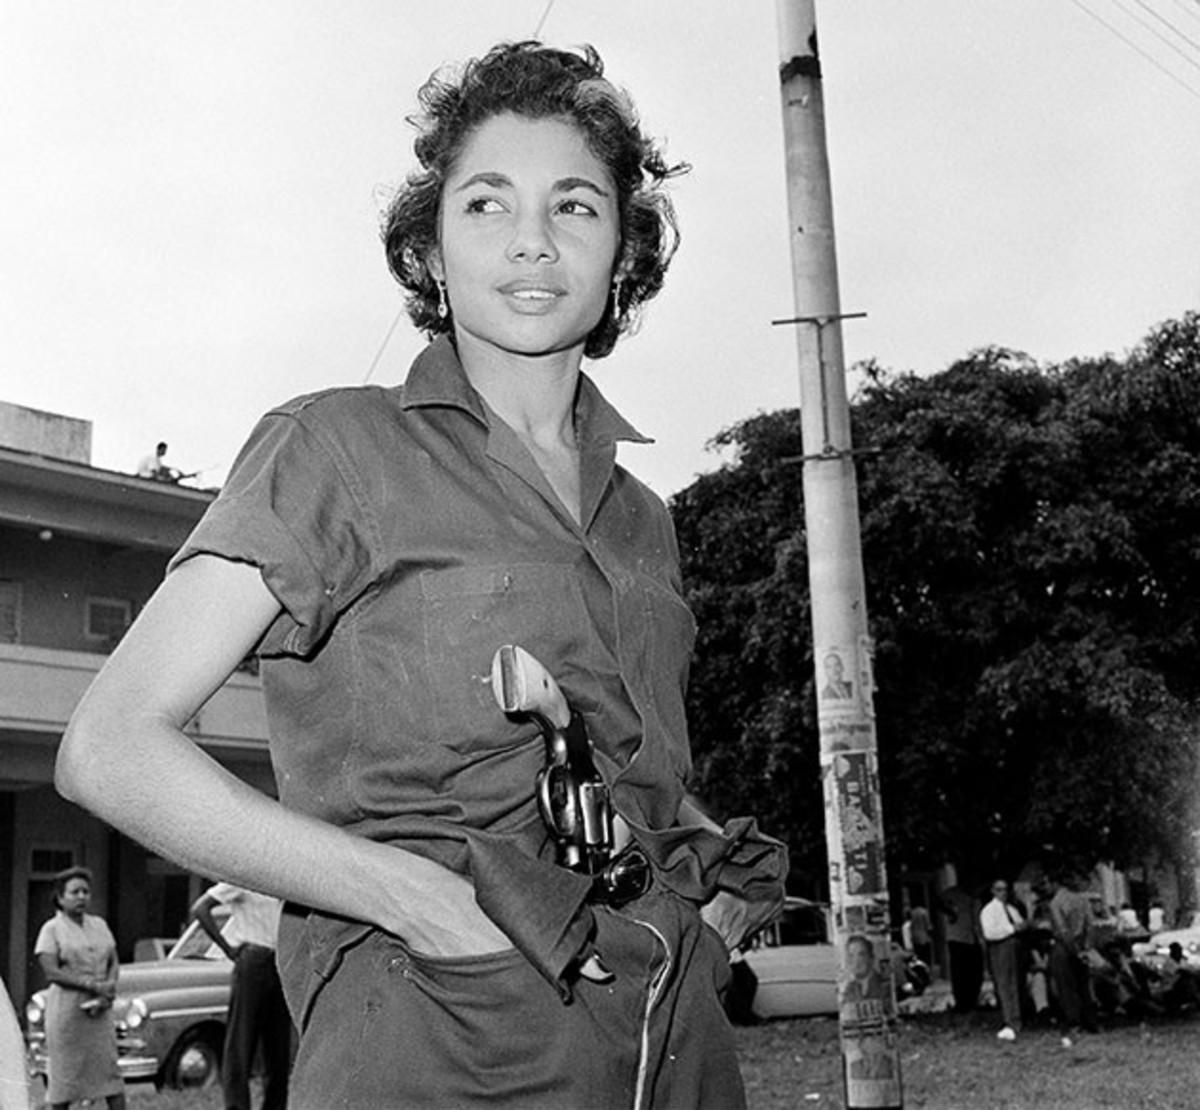 Young woman patrols the streets in post-Batista Havana.